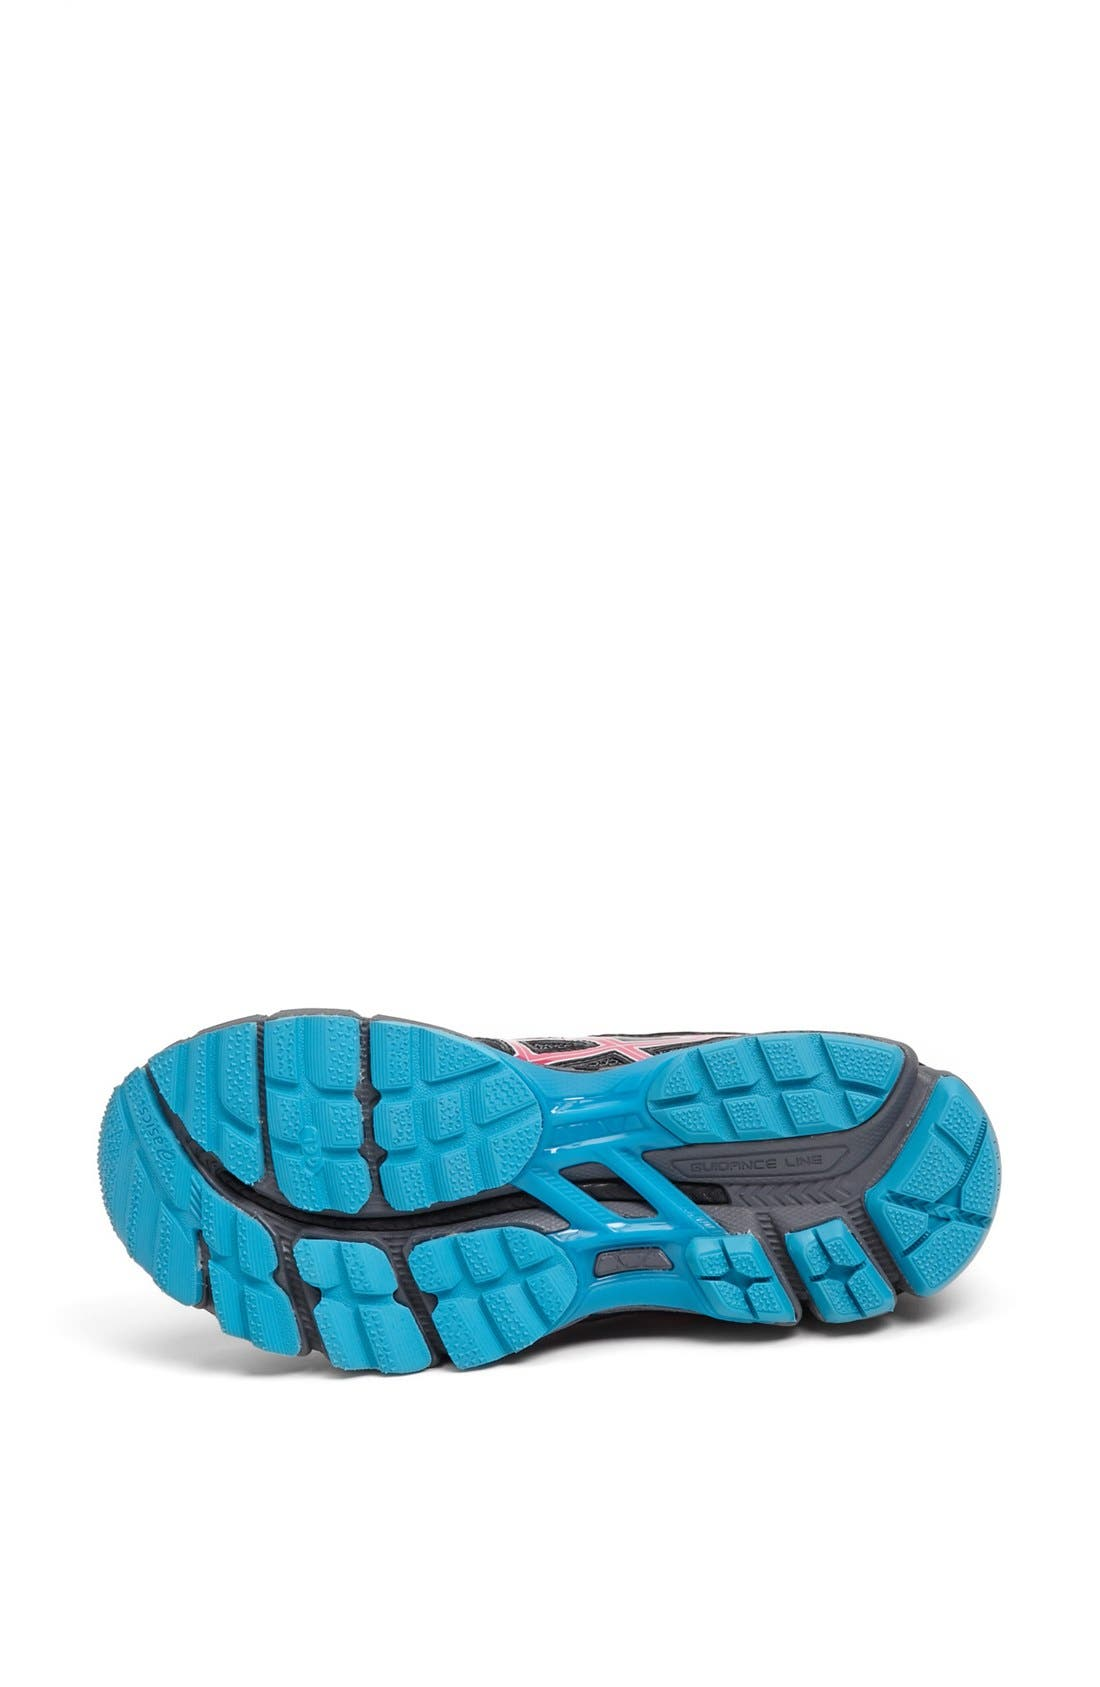 Alternate Image 4  - ASICS® 'GT-2000™ G-TX' Waterproof Running Shoe (Women)